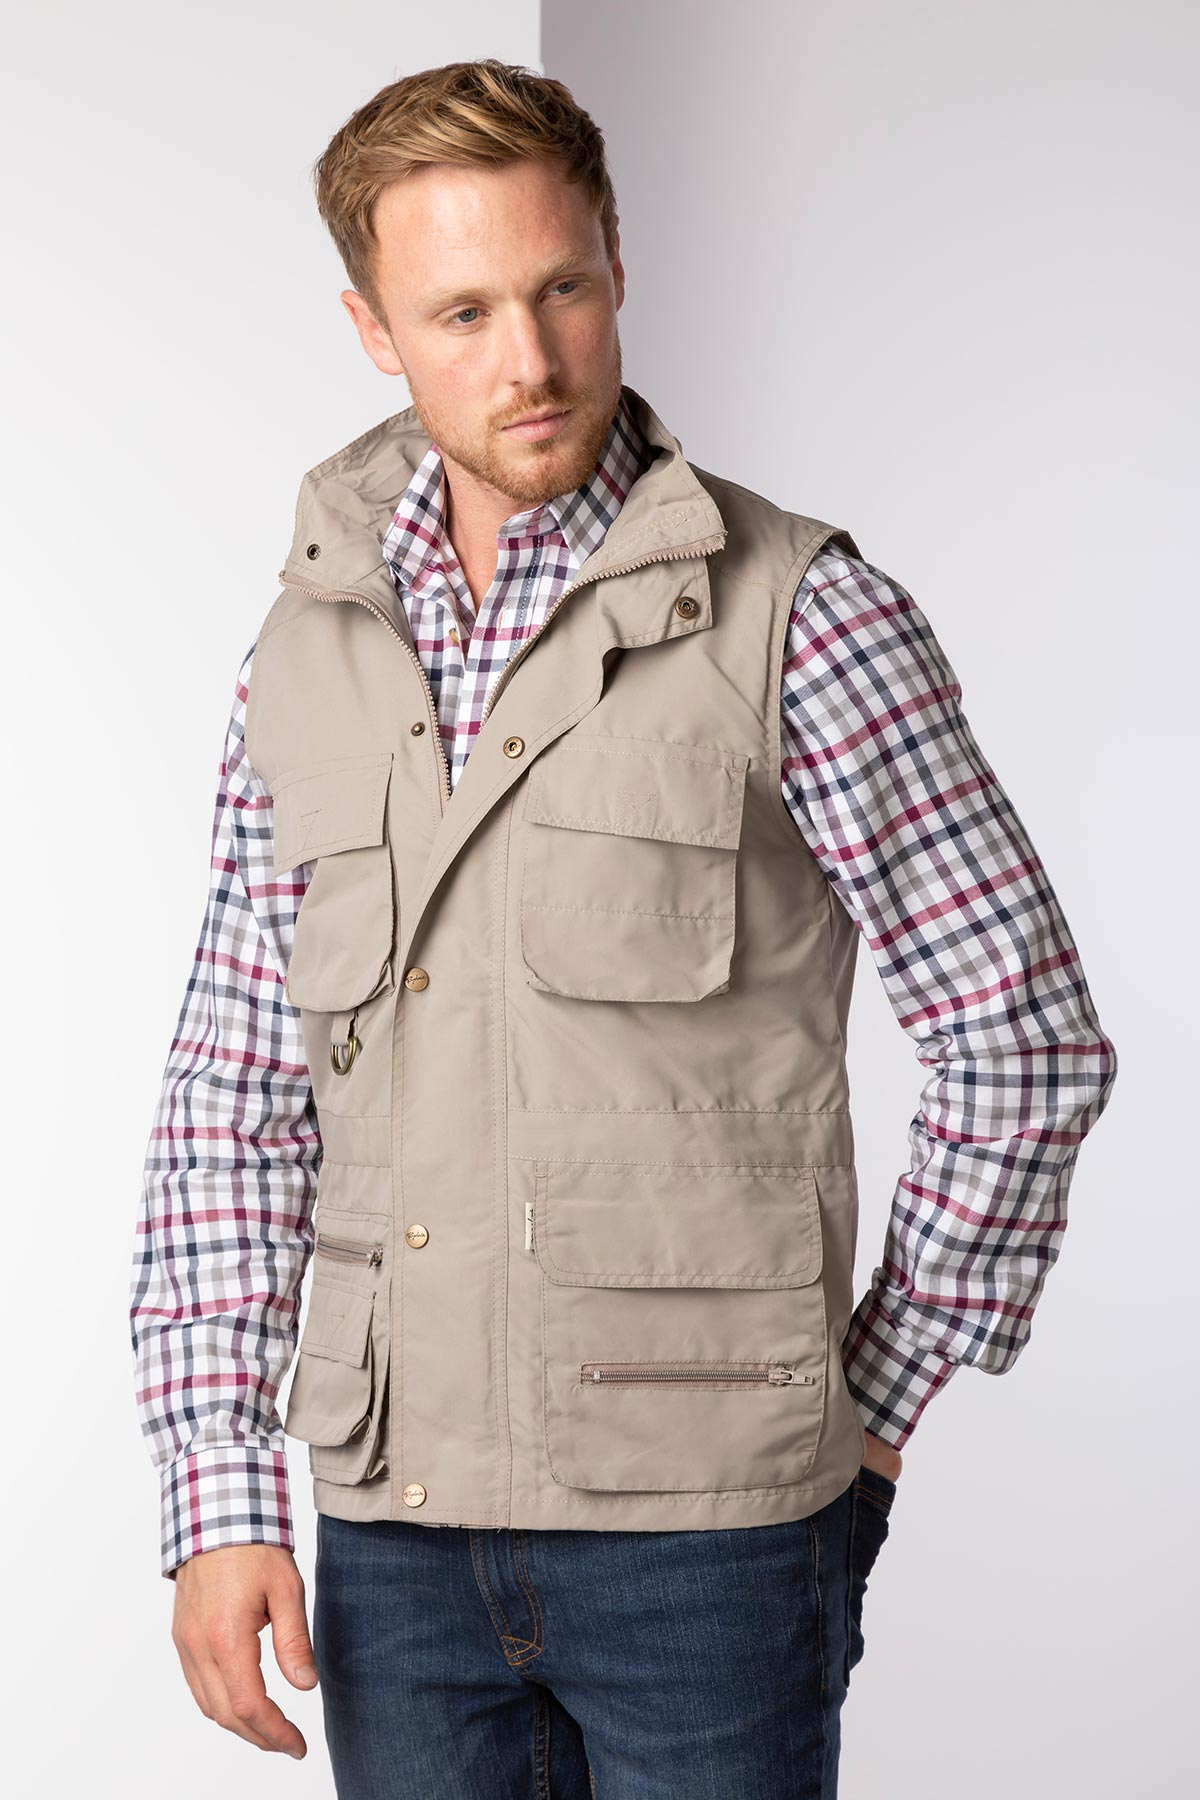 Men's Multi-Pocket Utility Vest